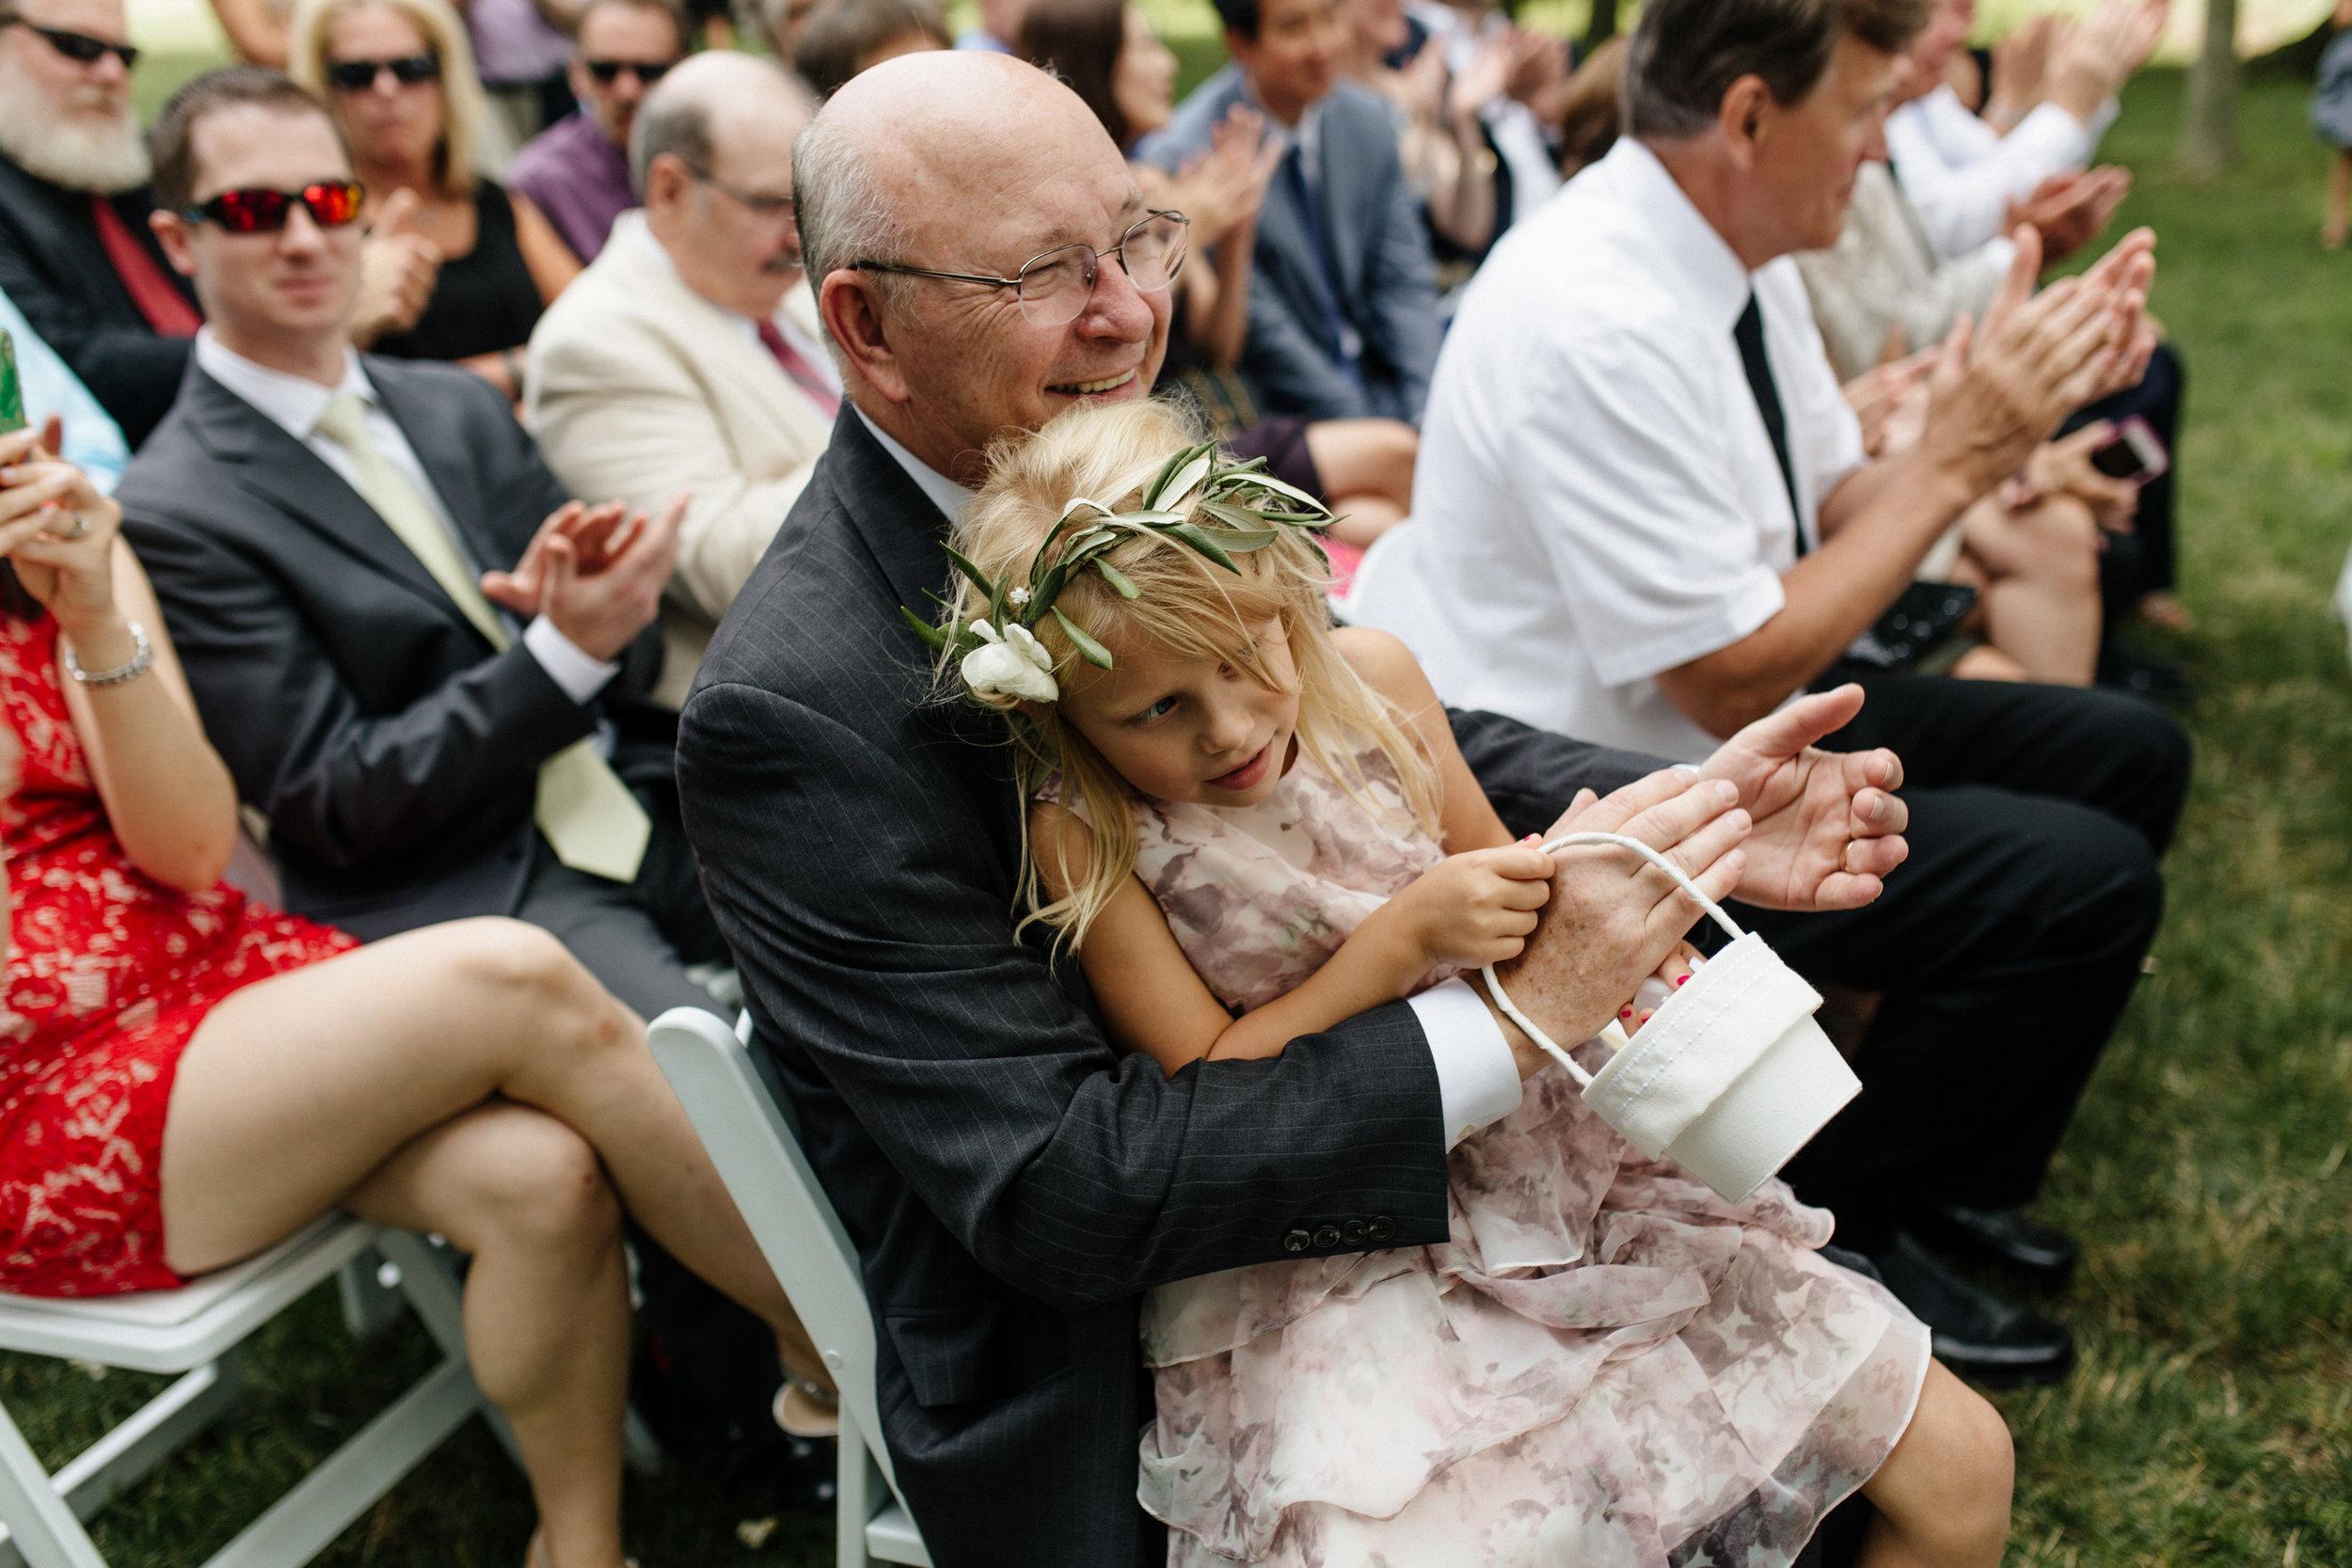 03-Smith-Wedding-Ceremony-188.jpg